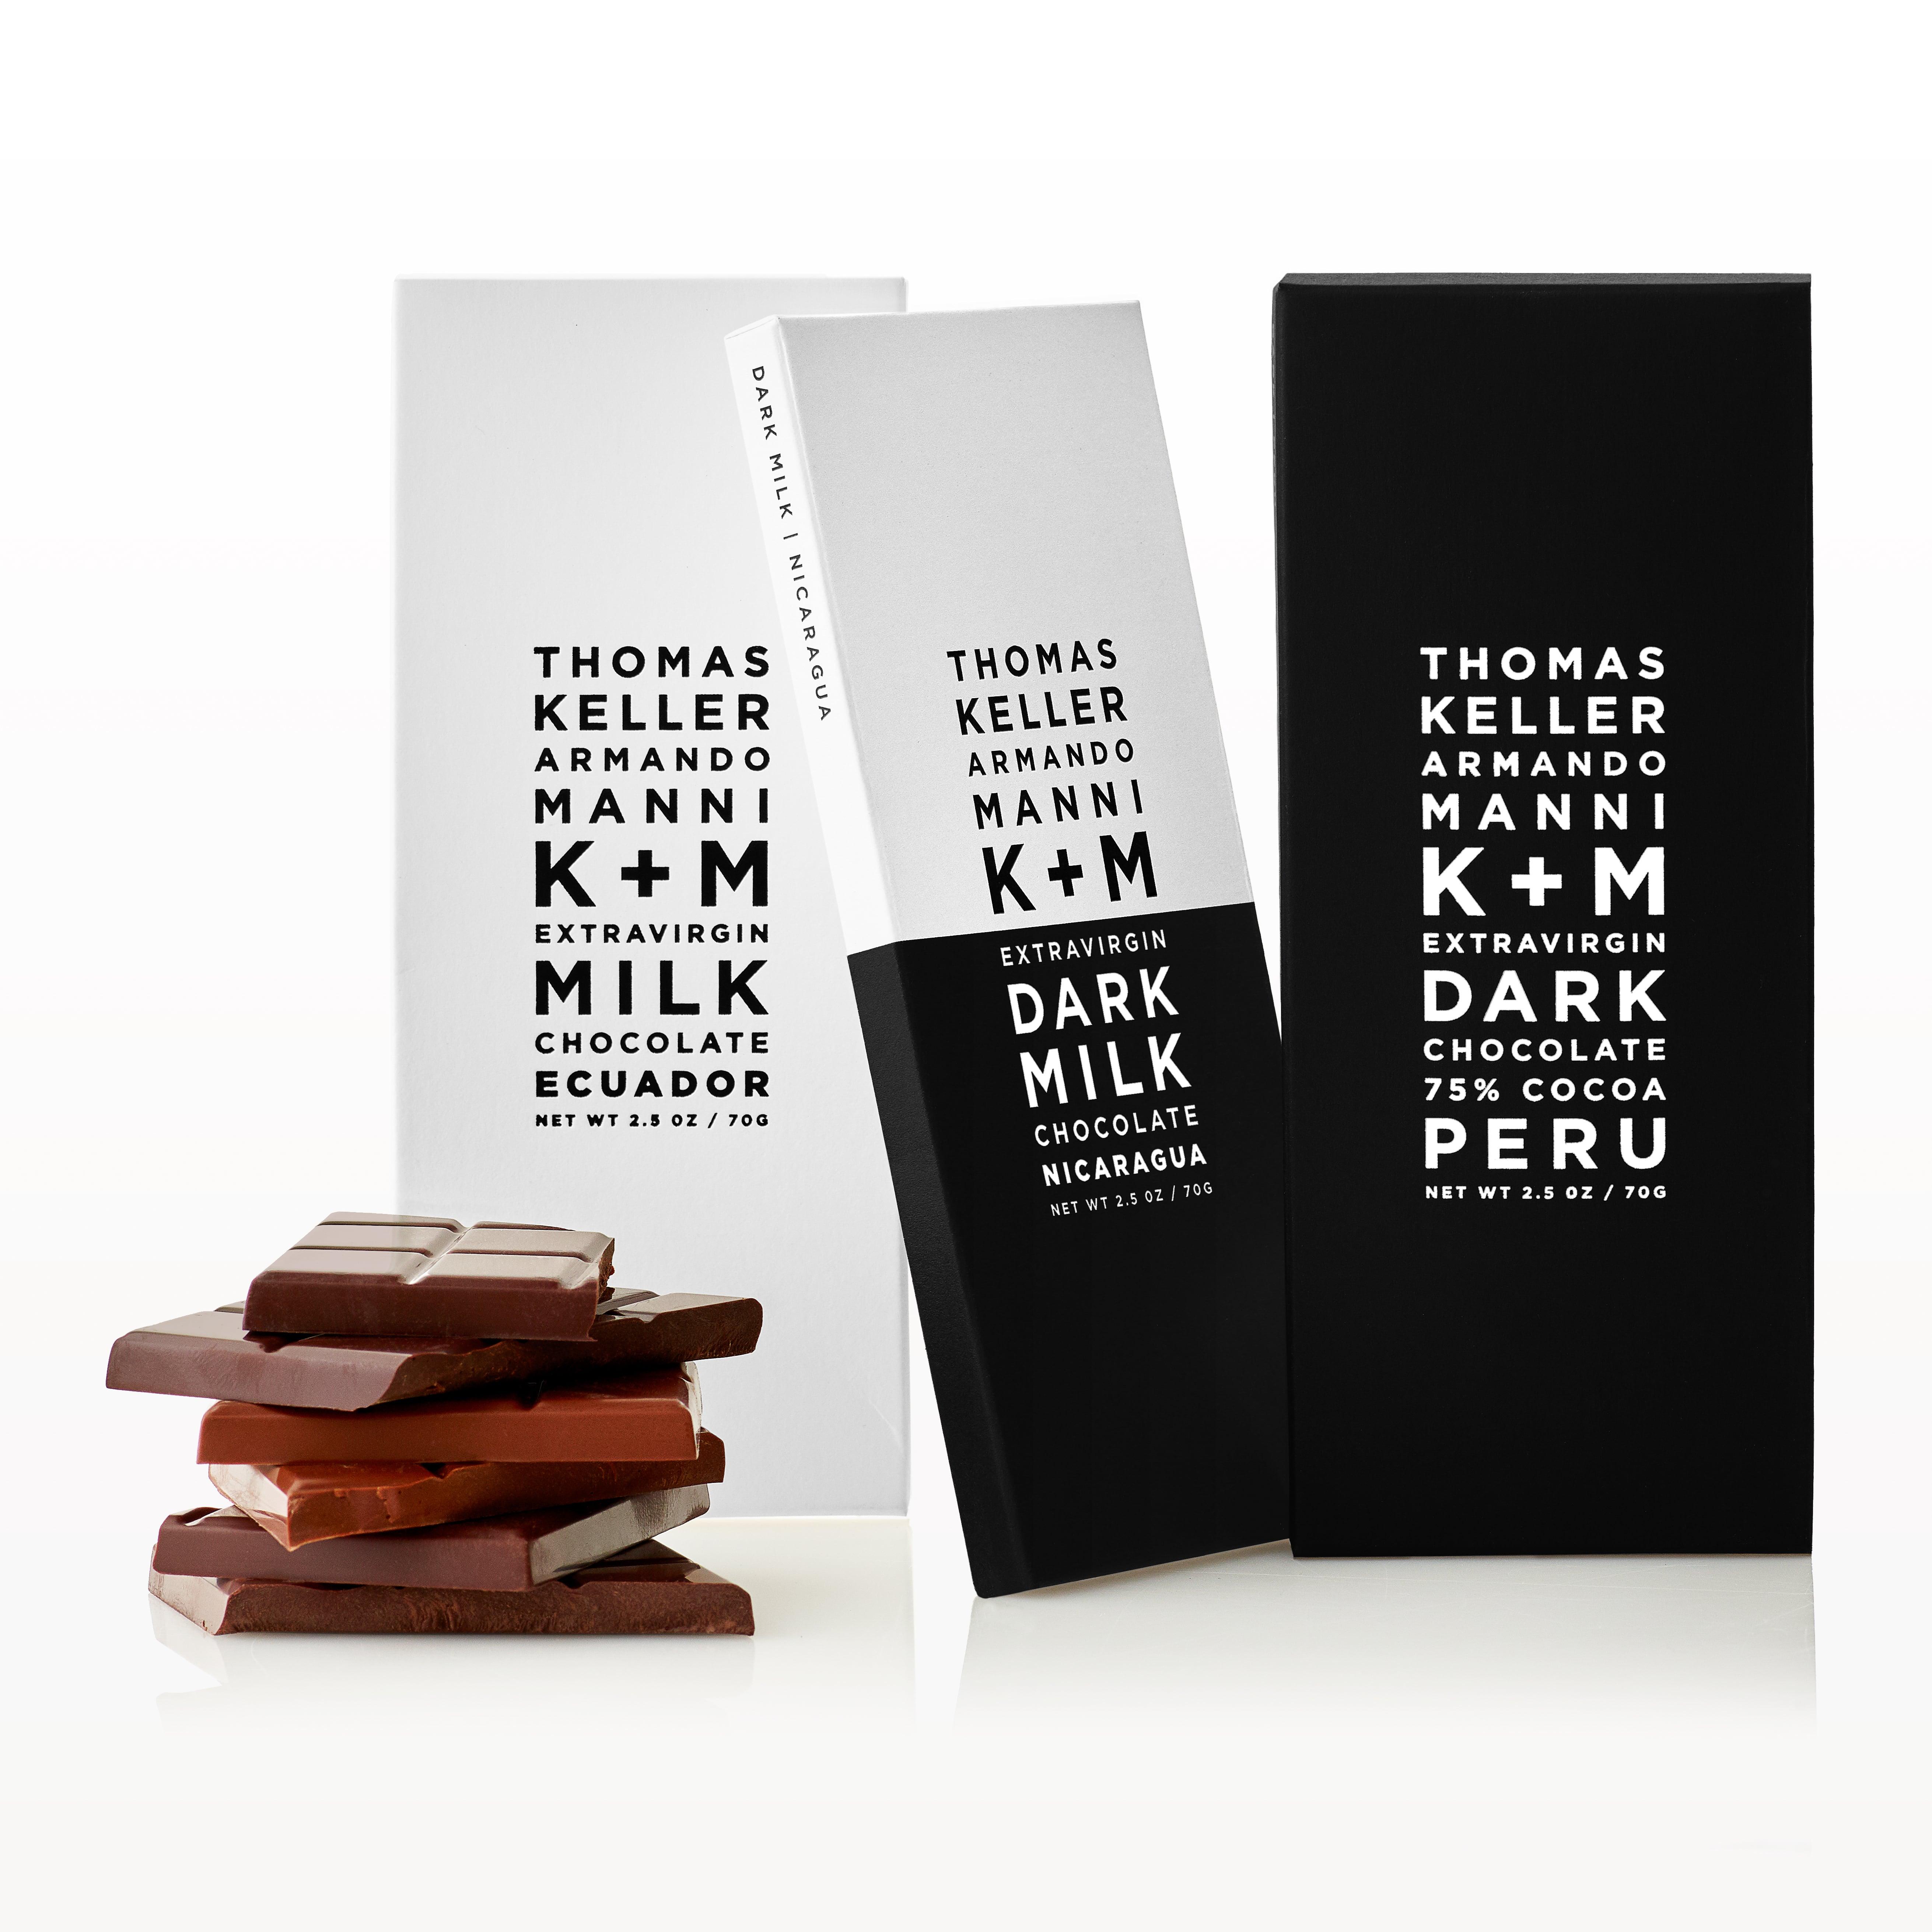 K+M Extravirgin 75% Dark Chocolate Ecuador Wins sofi Award